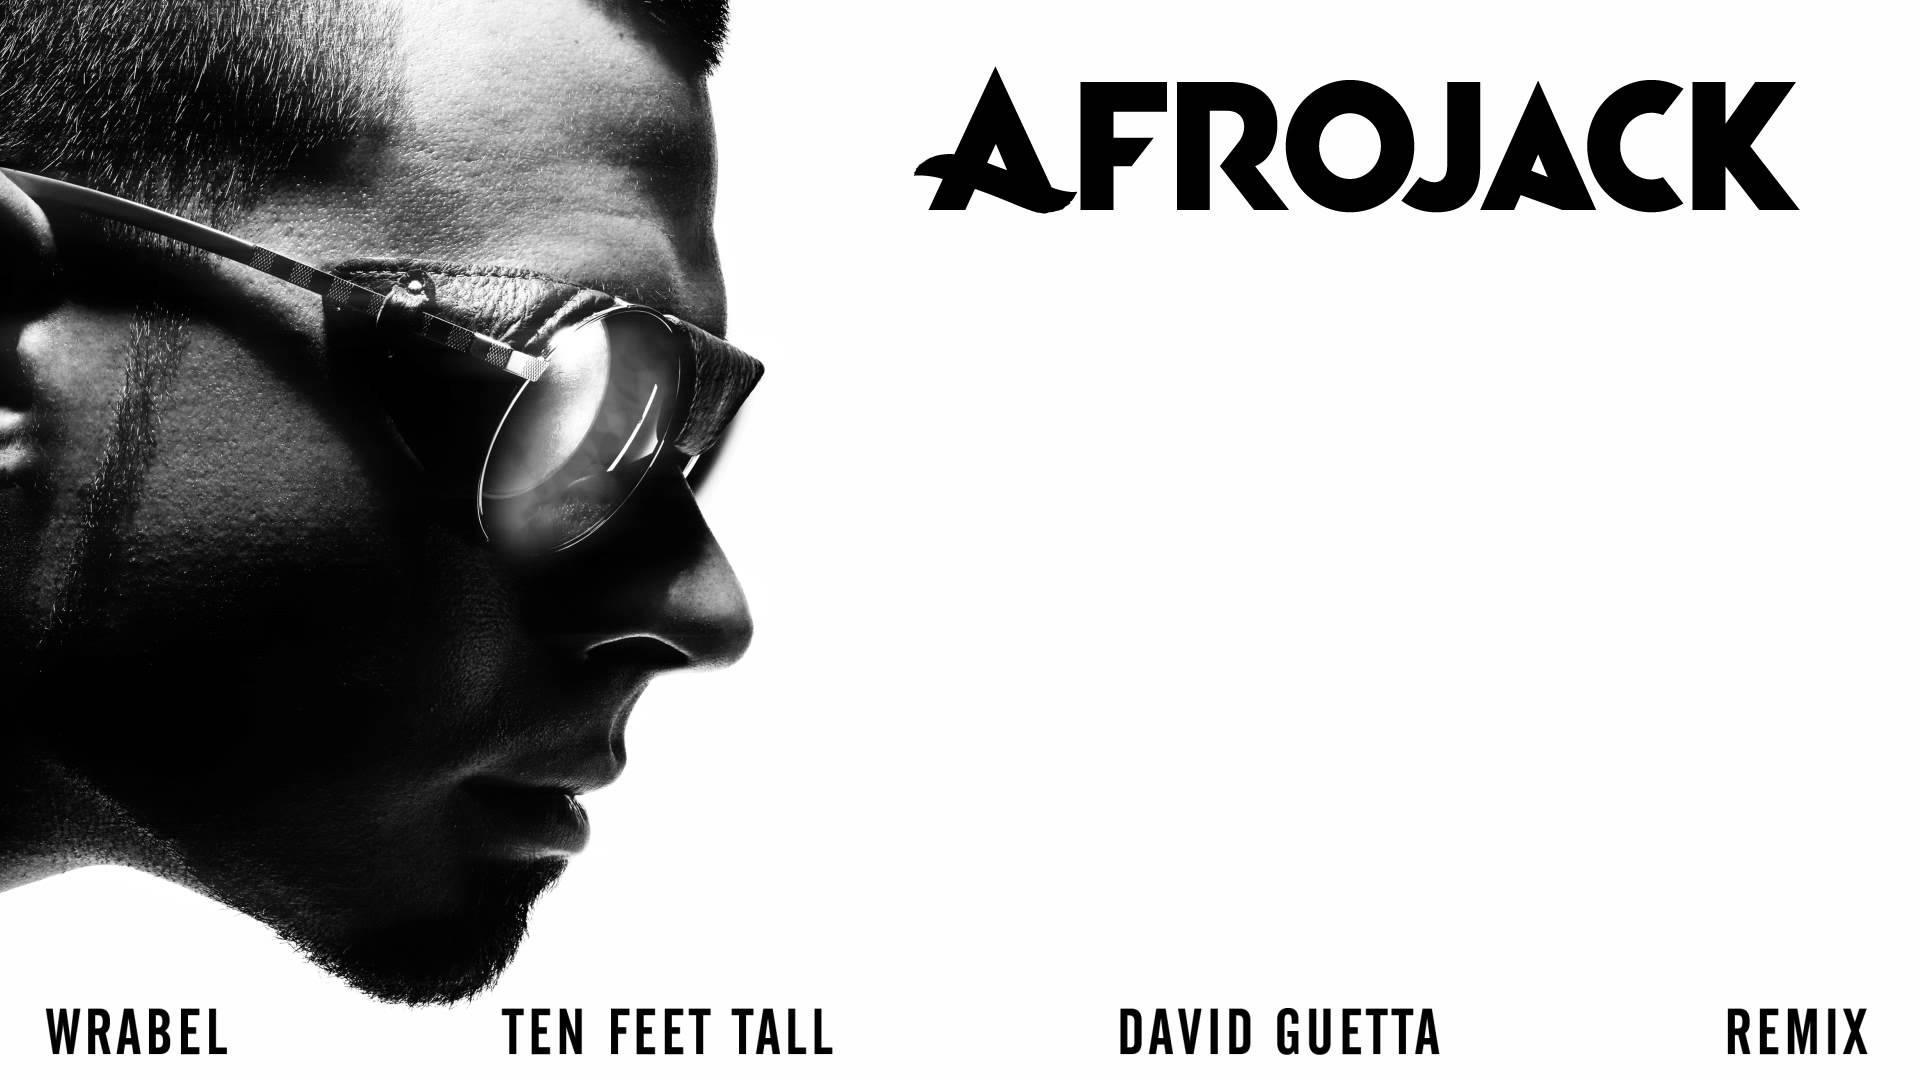 『Afrojack 人気曲ランキング』